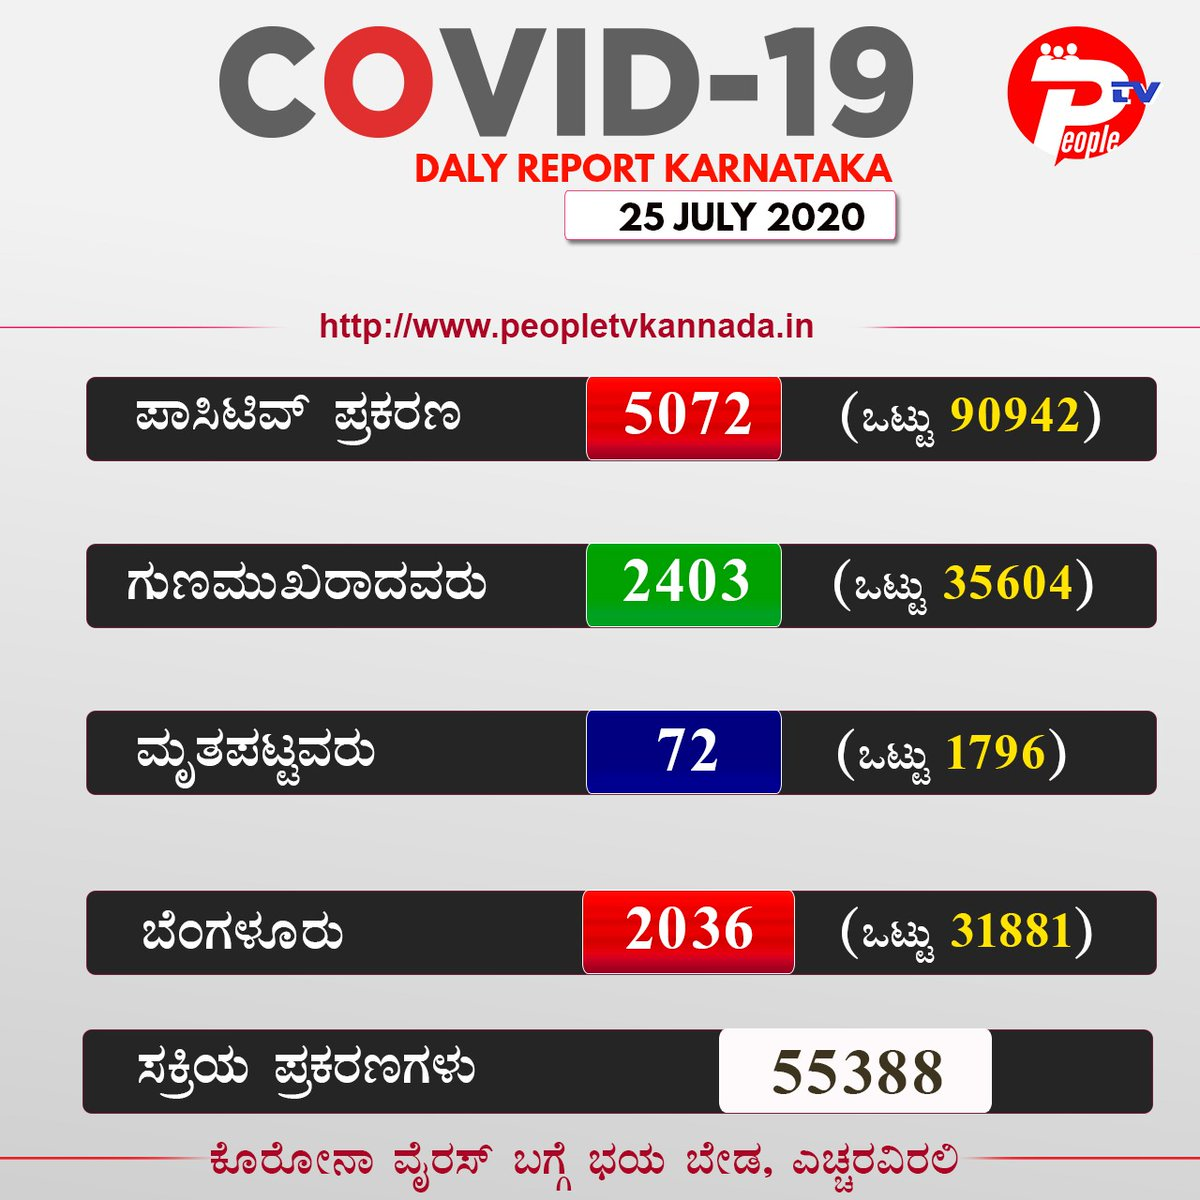 Covid19 Bulletin: 25th July 2020  #Karnataka  #PeopletvKannada #peopletvLive #peopletv #KannadaNewsChannel #LatestNews #LatestKannadaNews #Kannada #Newspic.twitter.com/8cOoyWBc2W